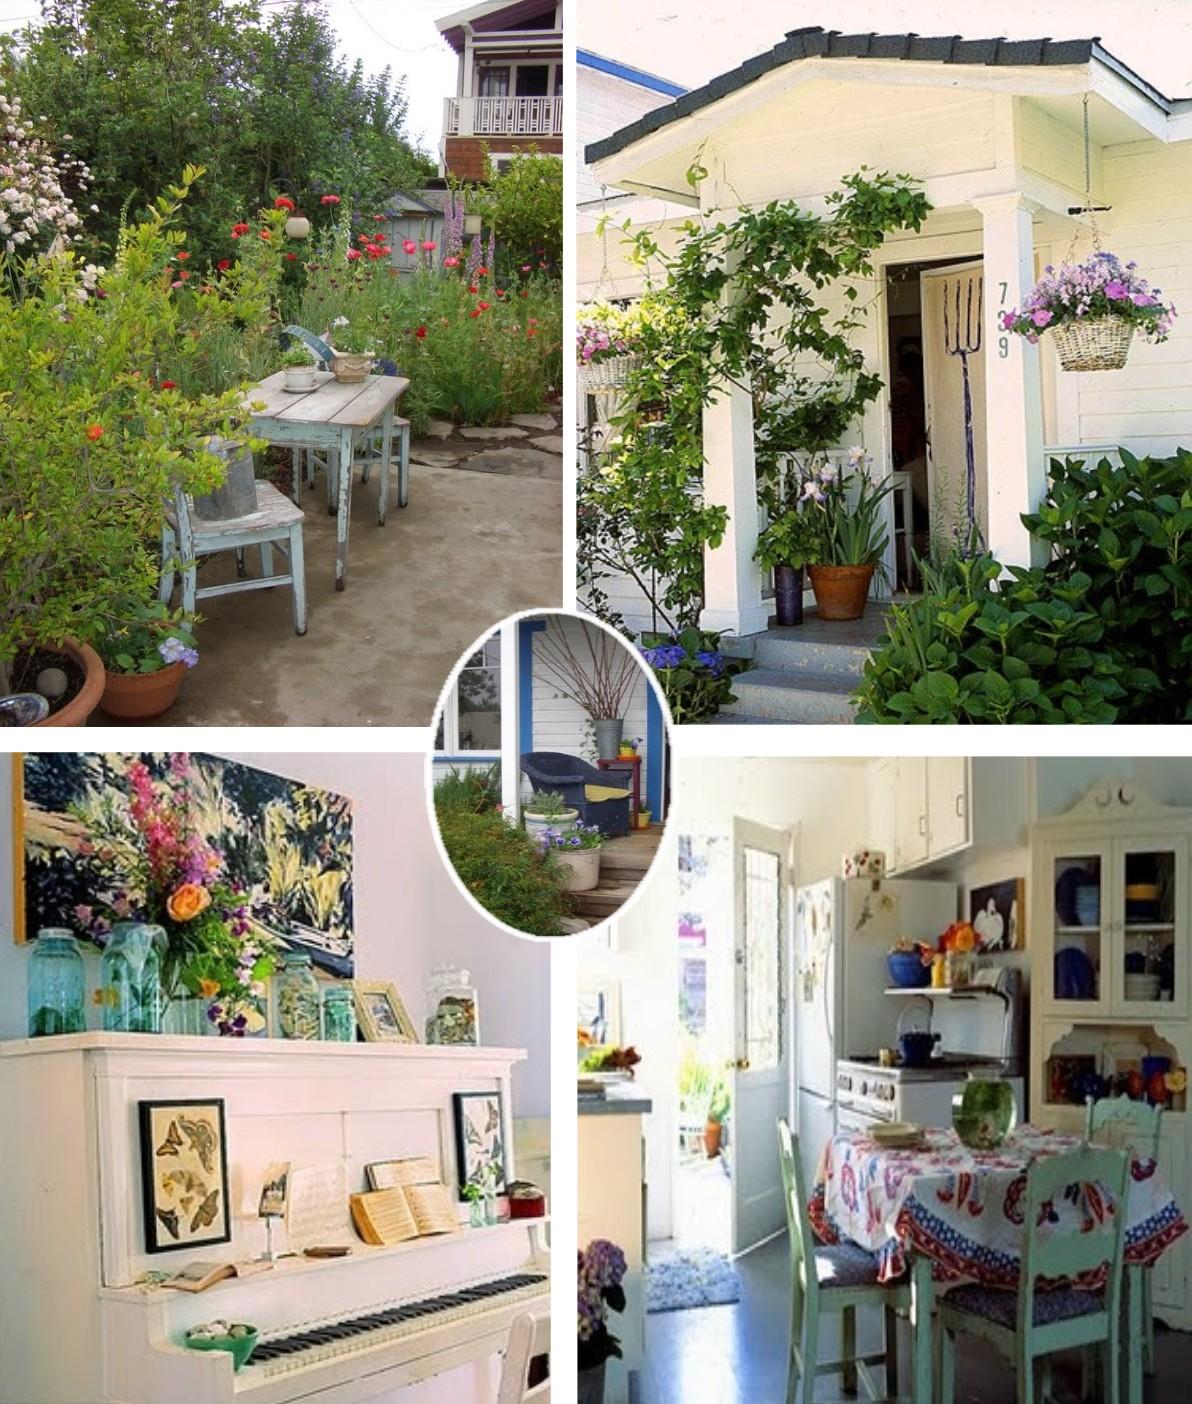 Venice Ca Artist S Garden Home Art Studios I Ciaotraveler